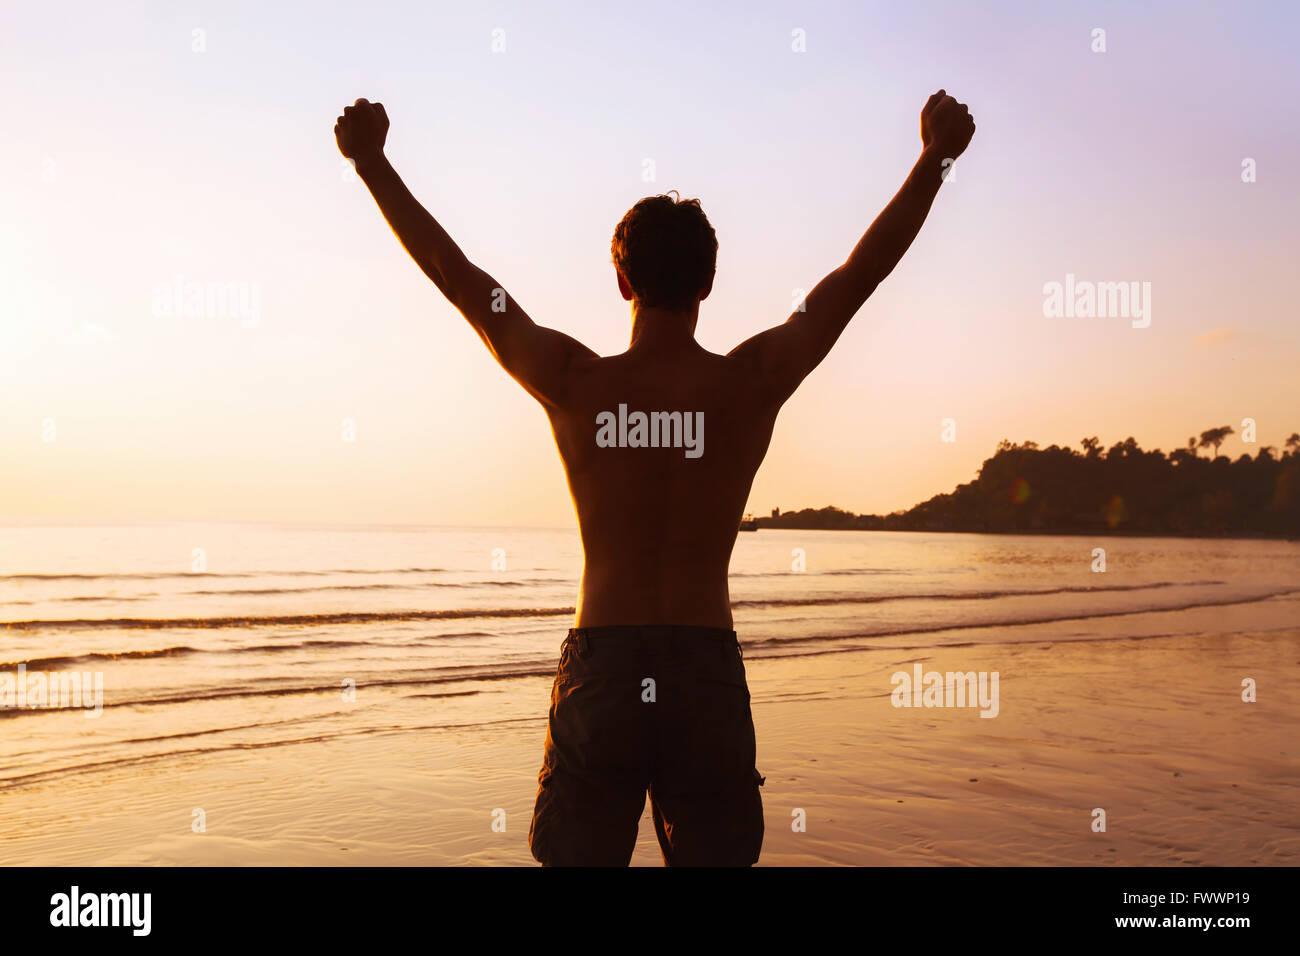 Antecedentes deportivos, silueta de fuerte hombre deportiva en la playa, ganador o logro concepto Imagen De Stock